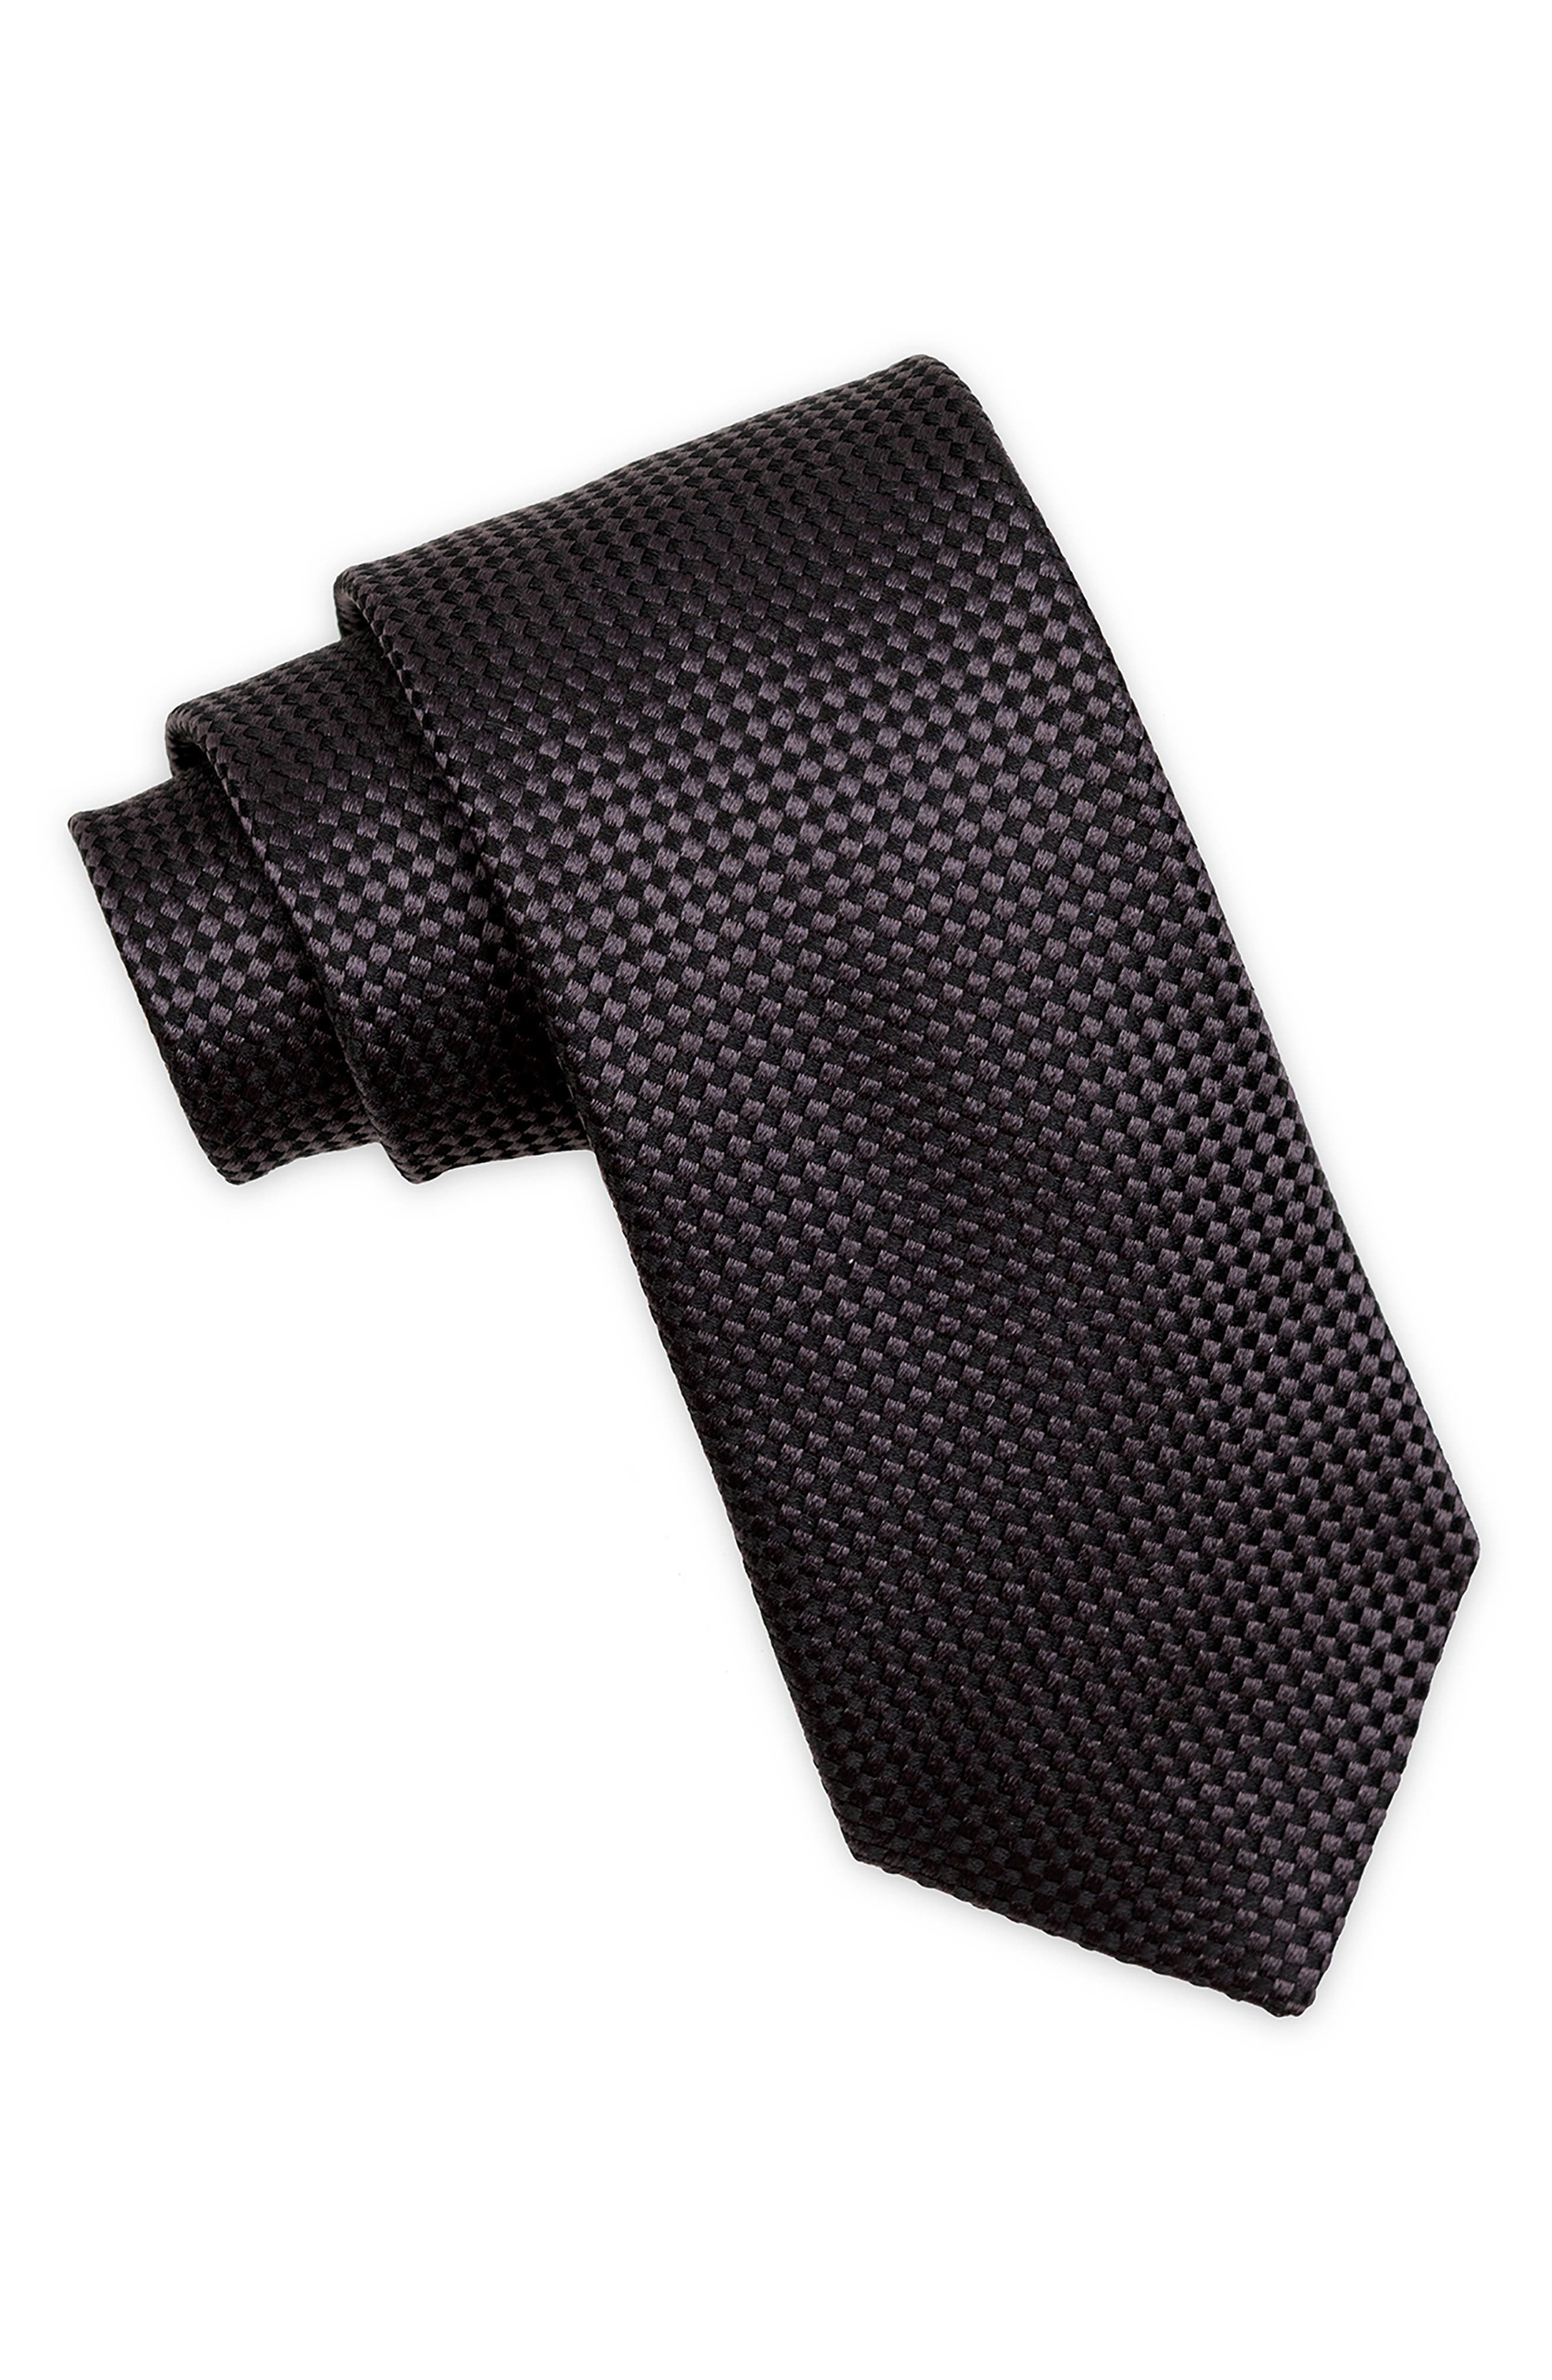 Nate Textured Silk Tie,                             Main thumbnail 1, color,                             BLACK